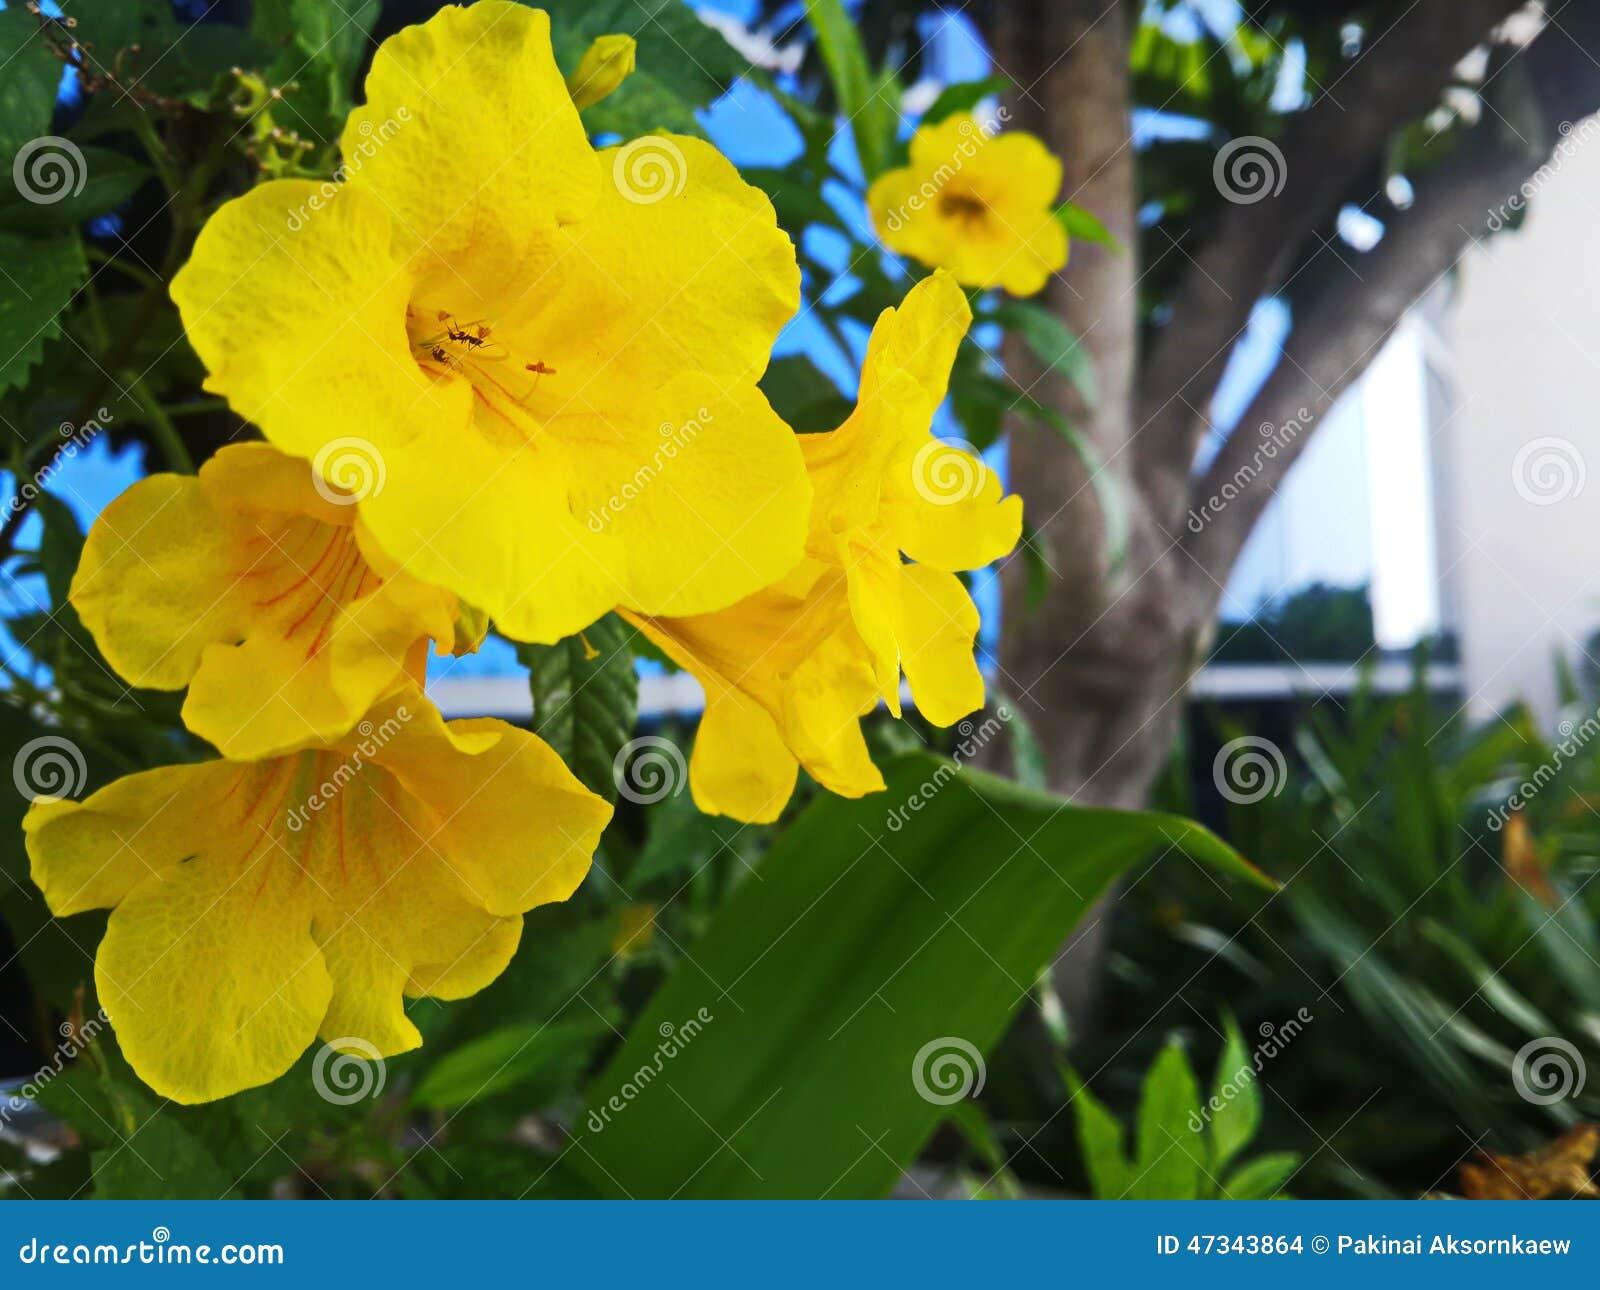 Yellow Rare Wild Flowers Stock Photo Image Of Countries 47343864